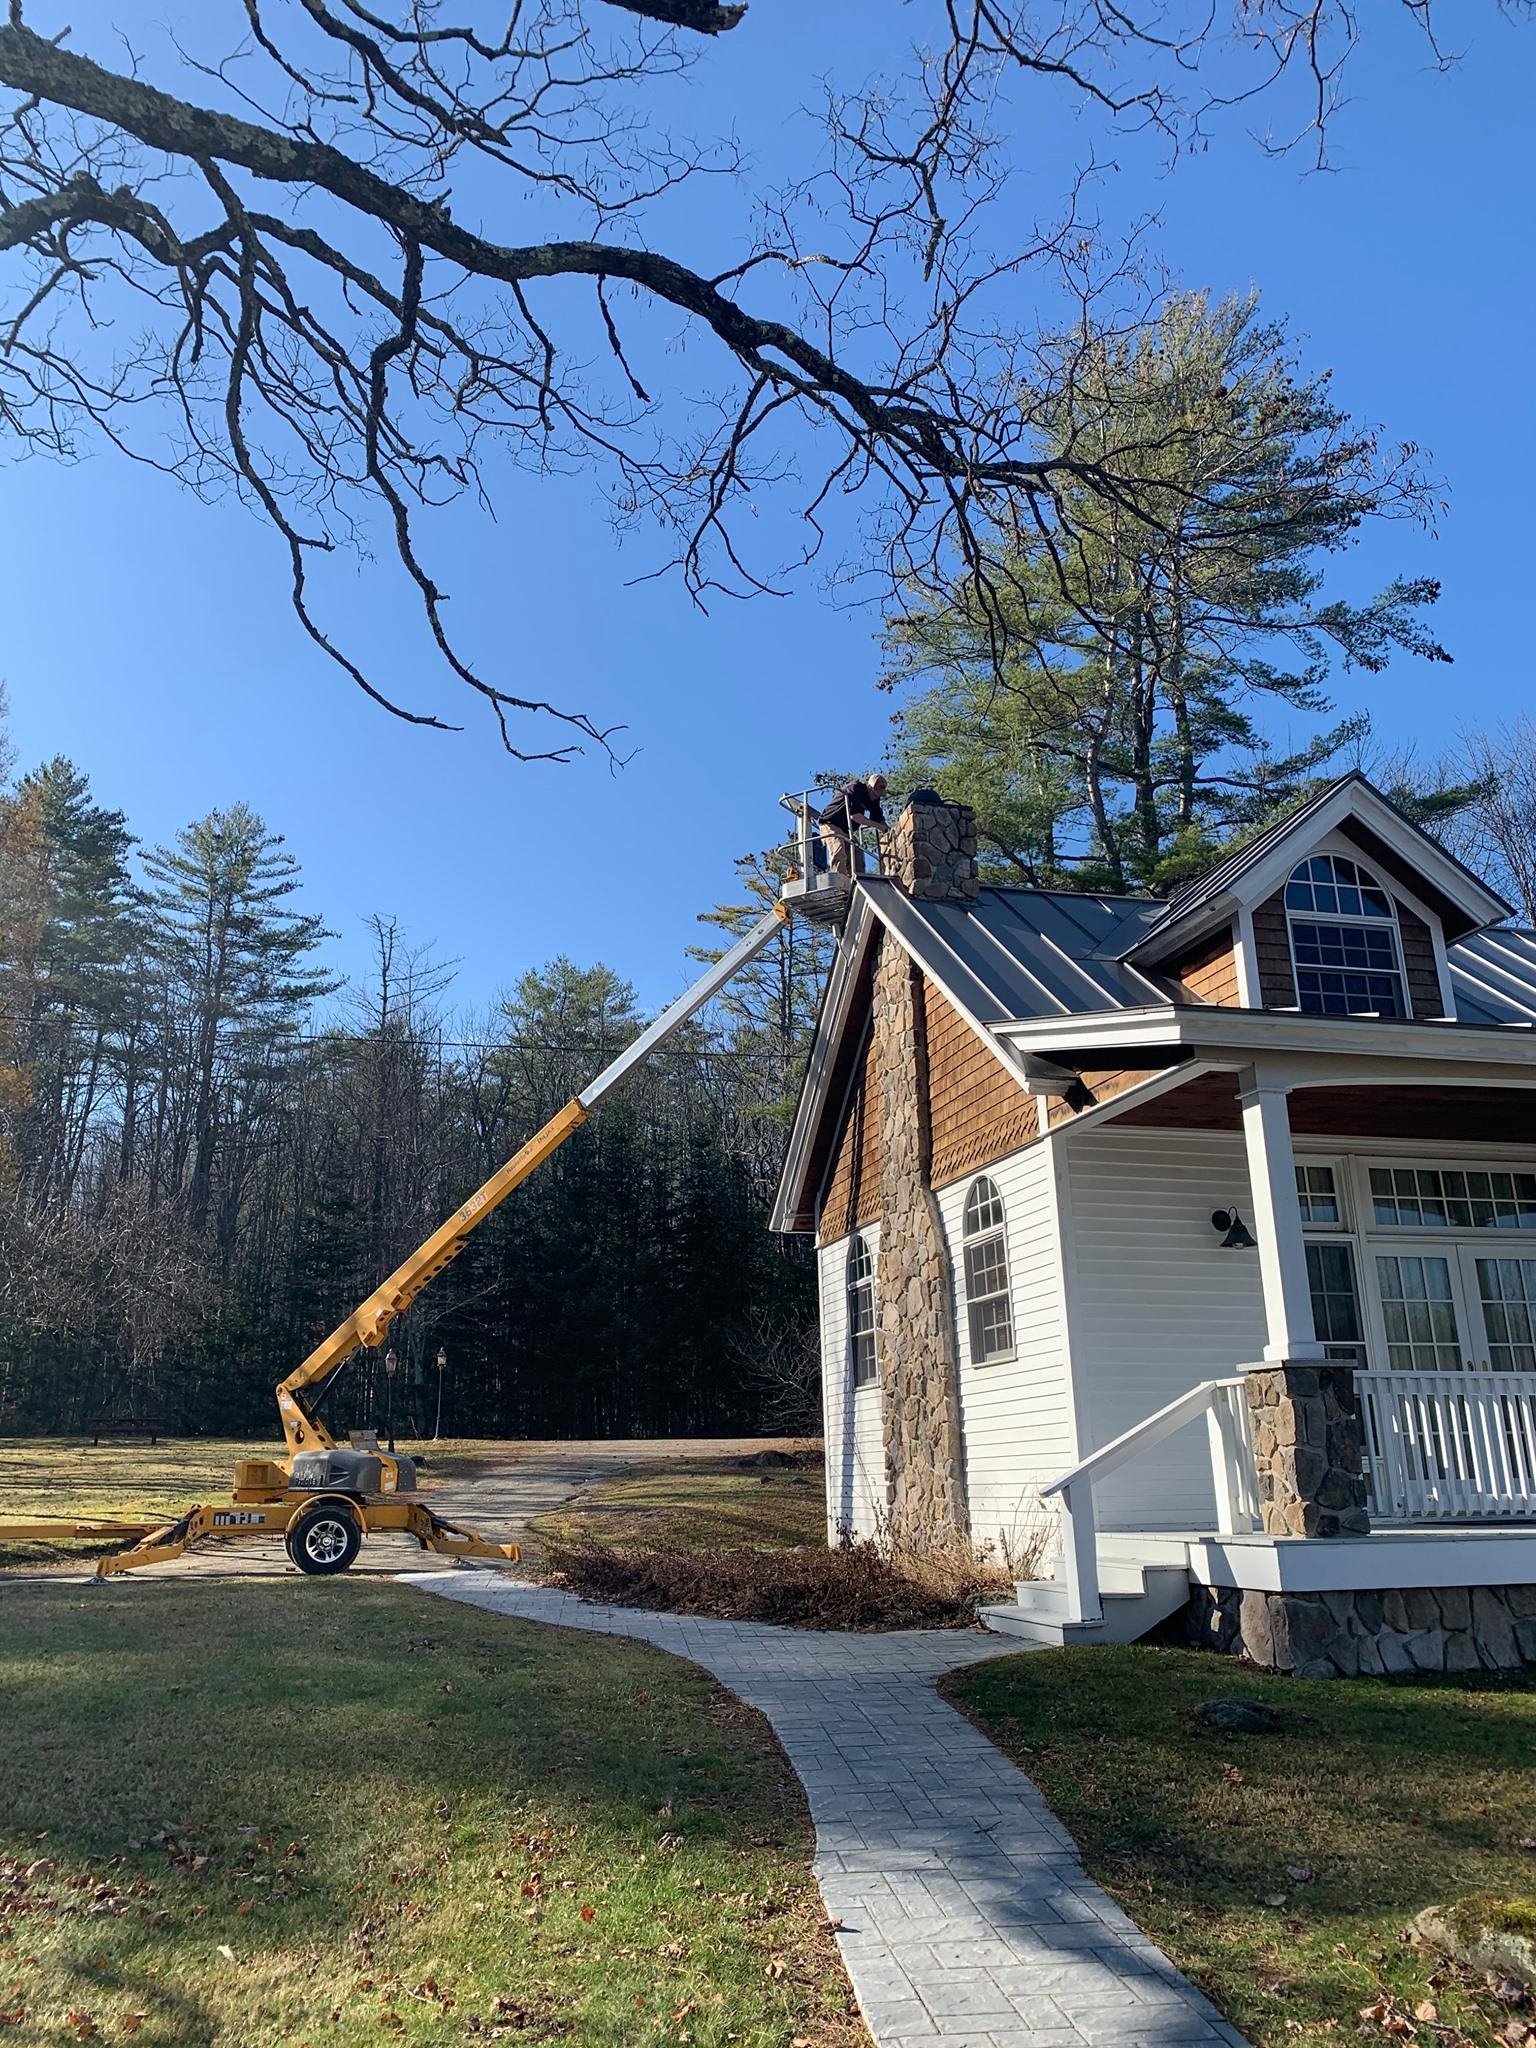 Restoring the Sugar Hill Inn - Historic Preservation of a 200 year old Inn (Part 1) 1